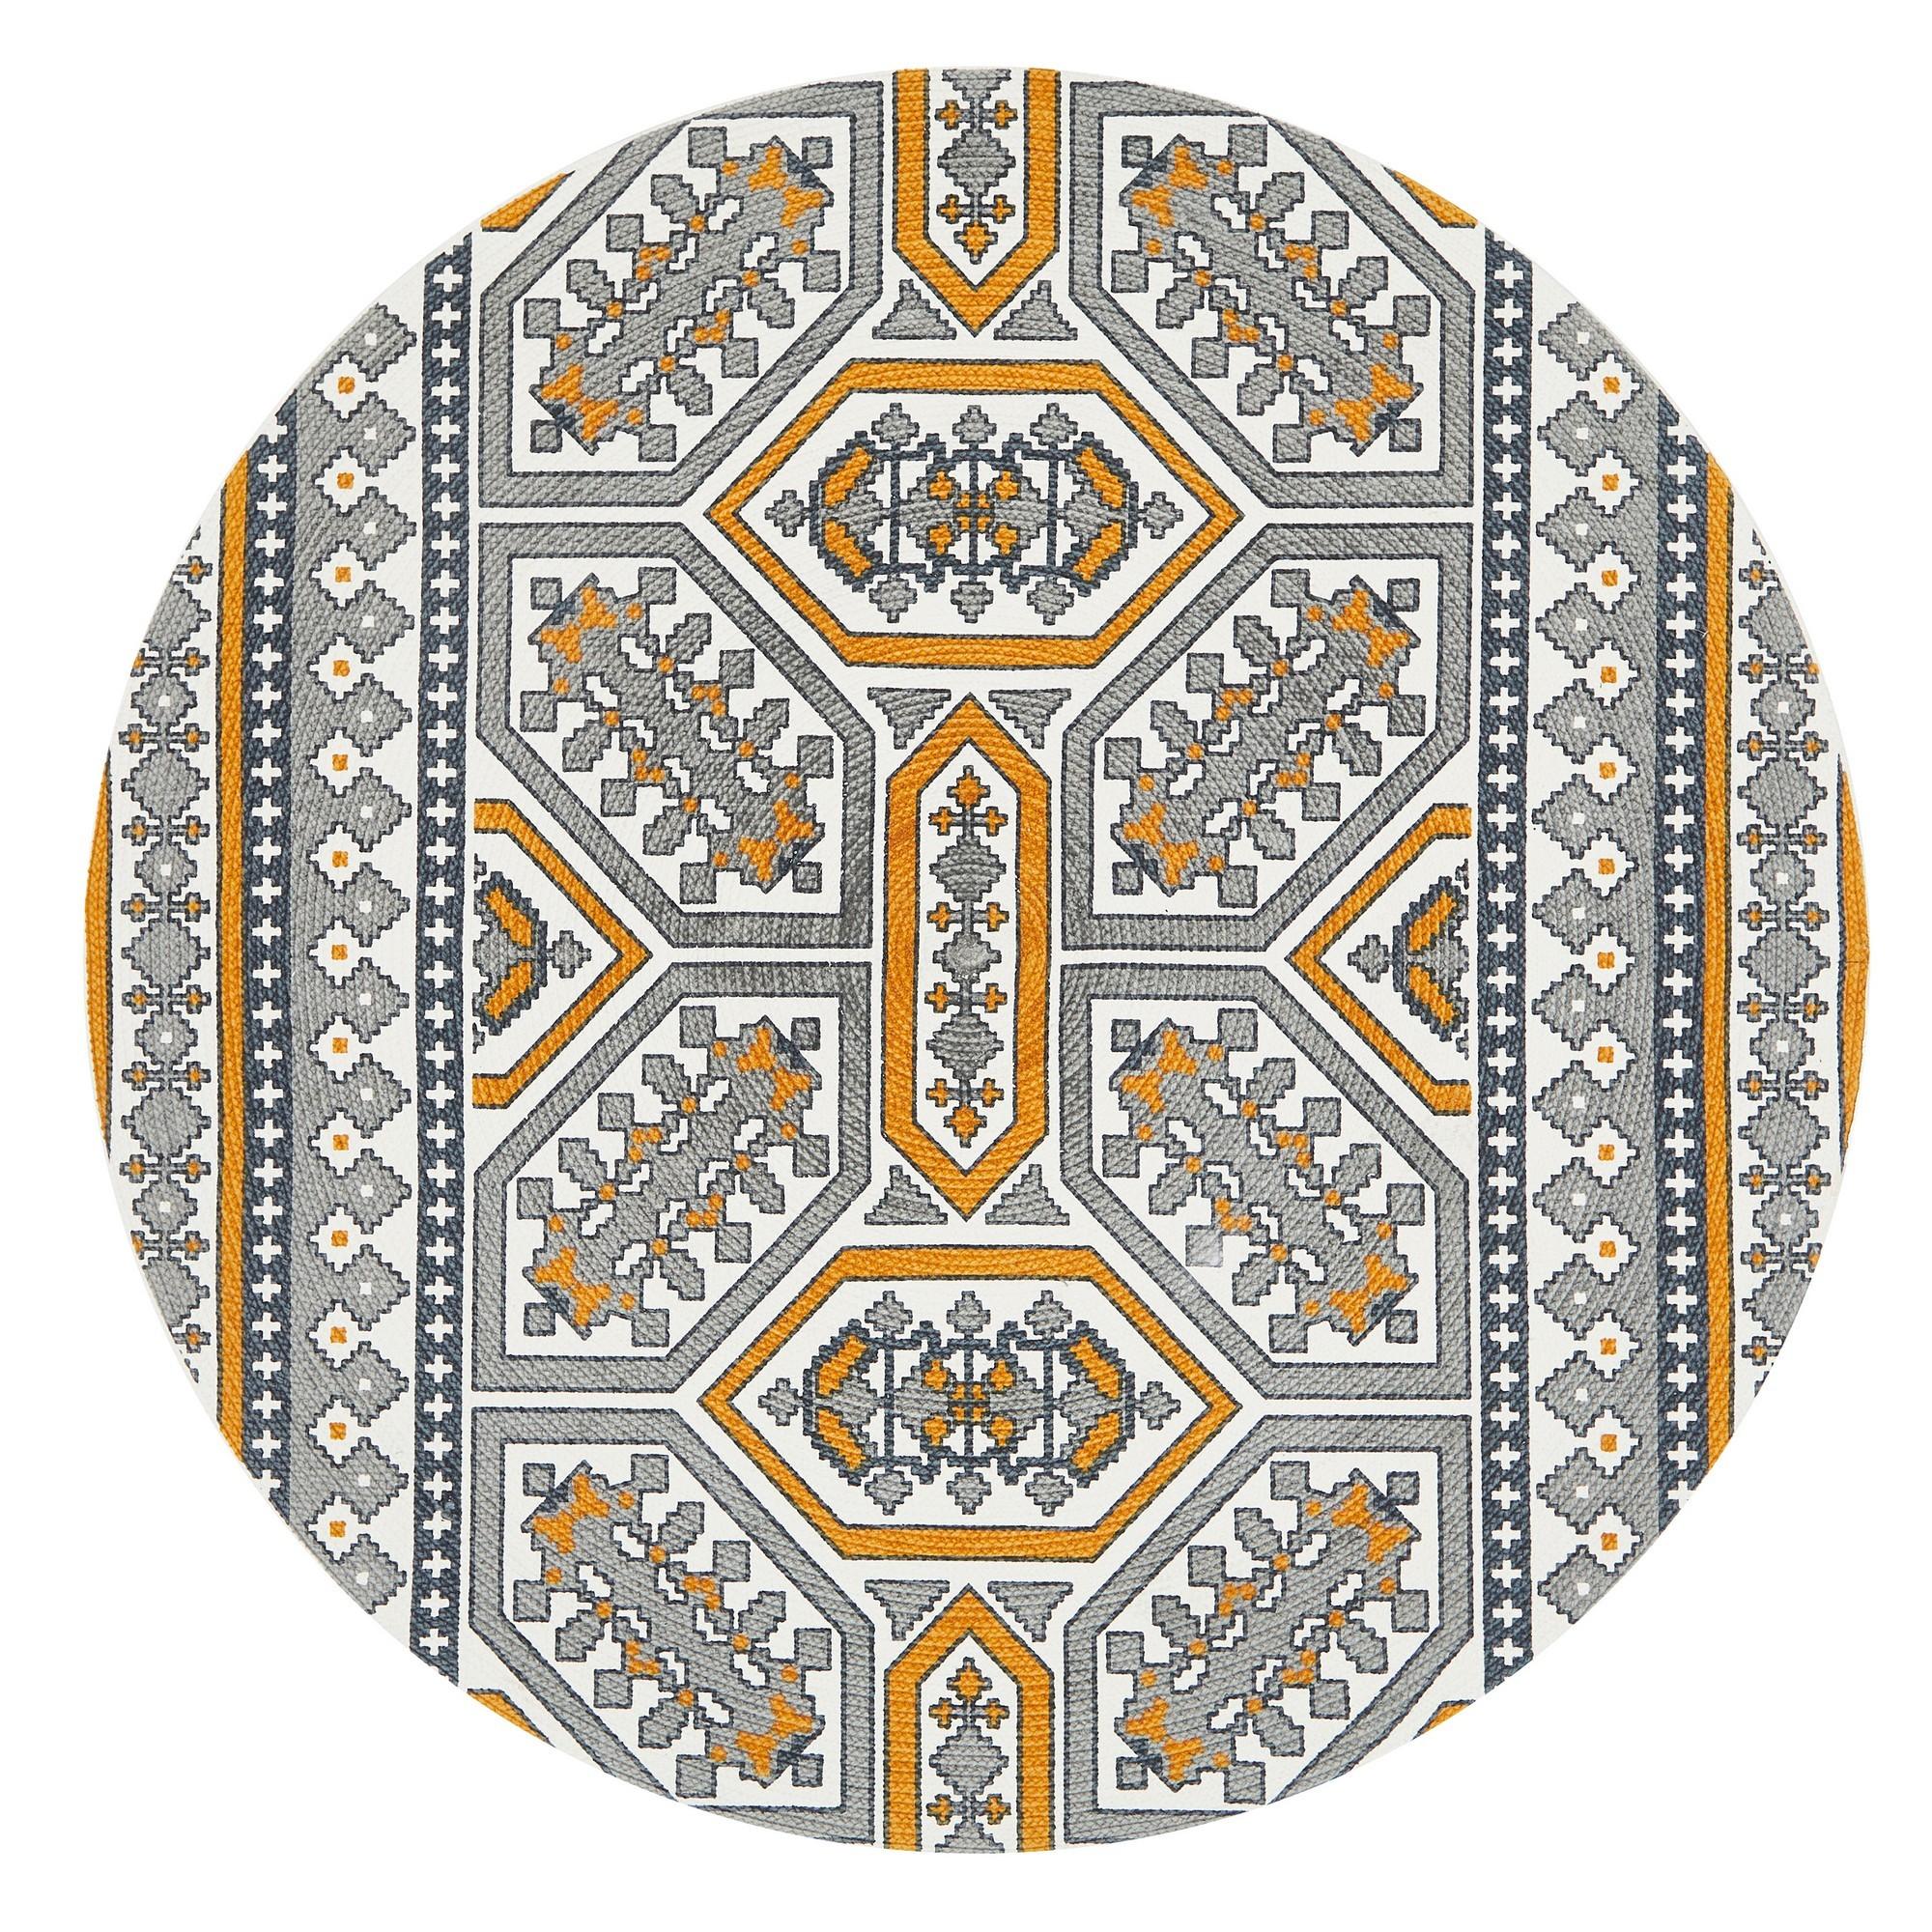 Lunar Darcy Printed Cotton Round Rug, 120cm